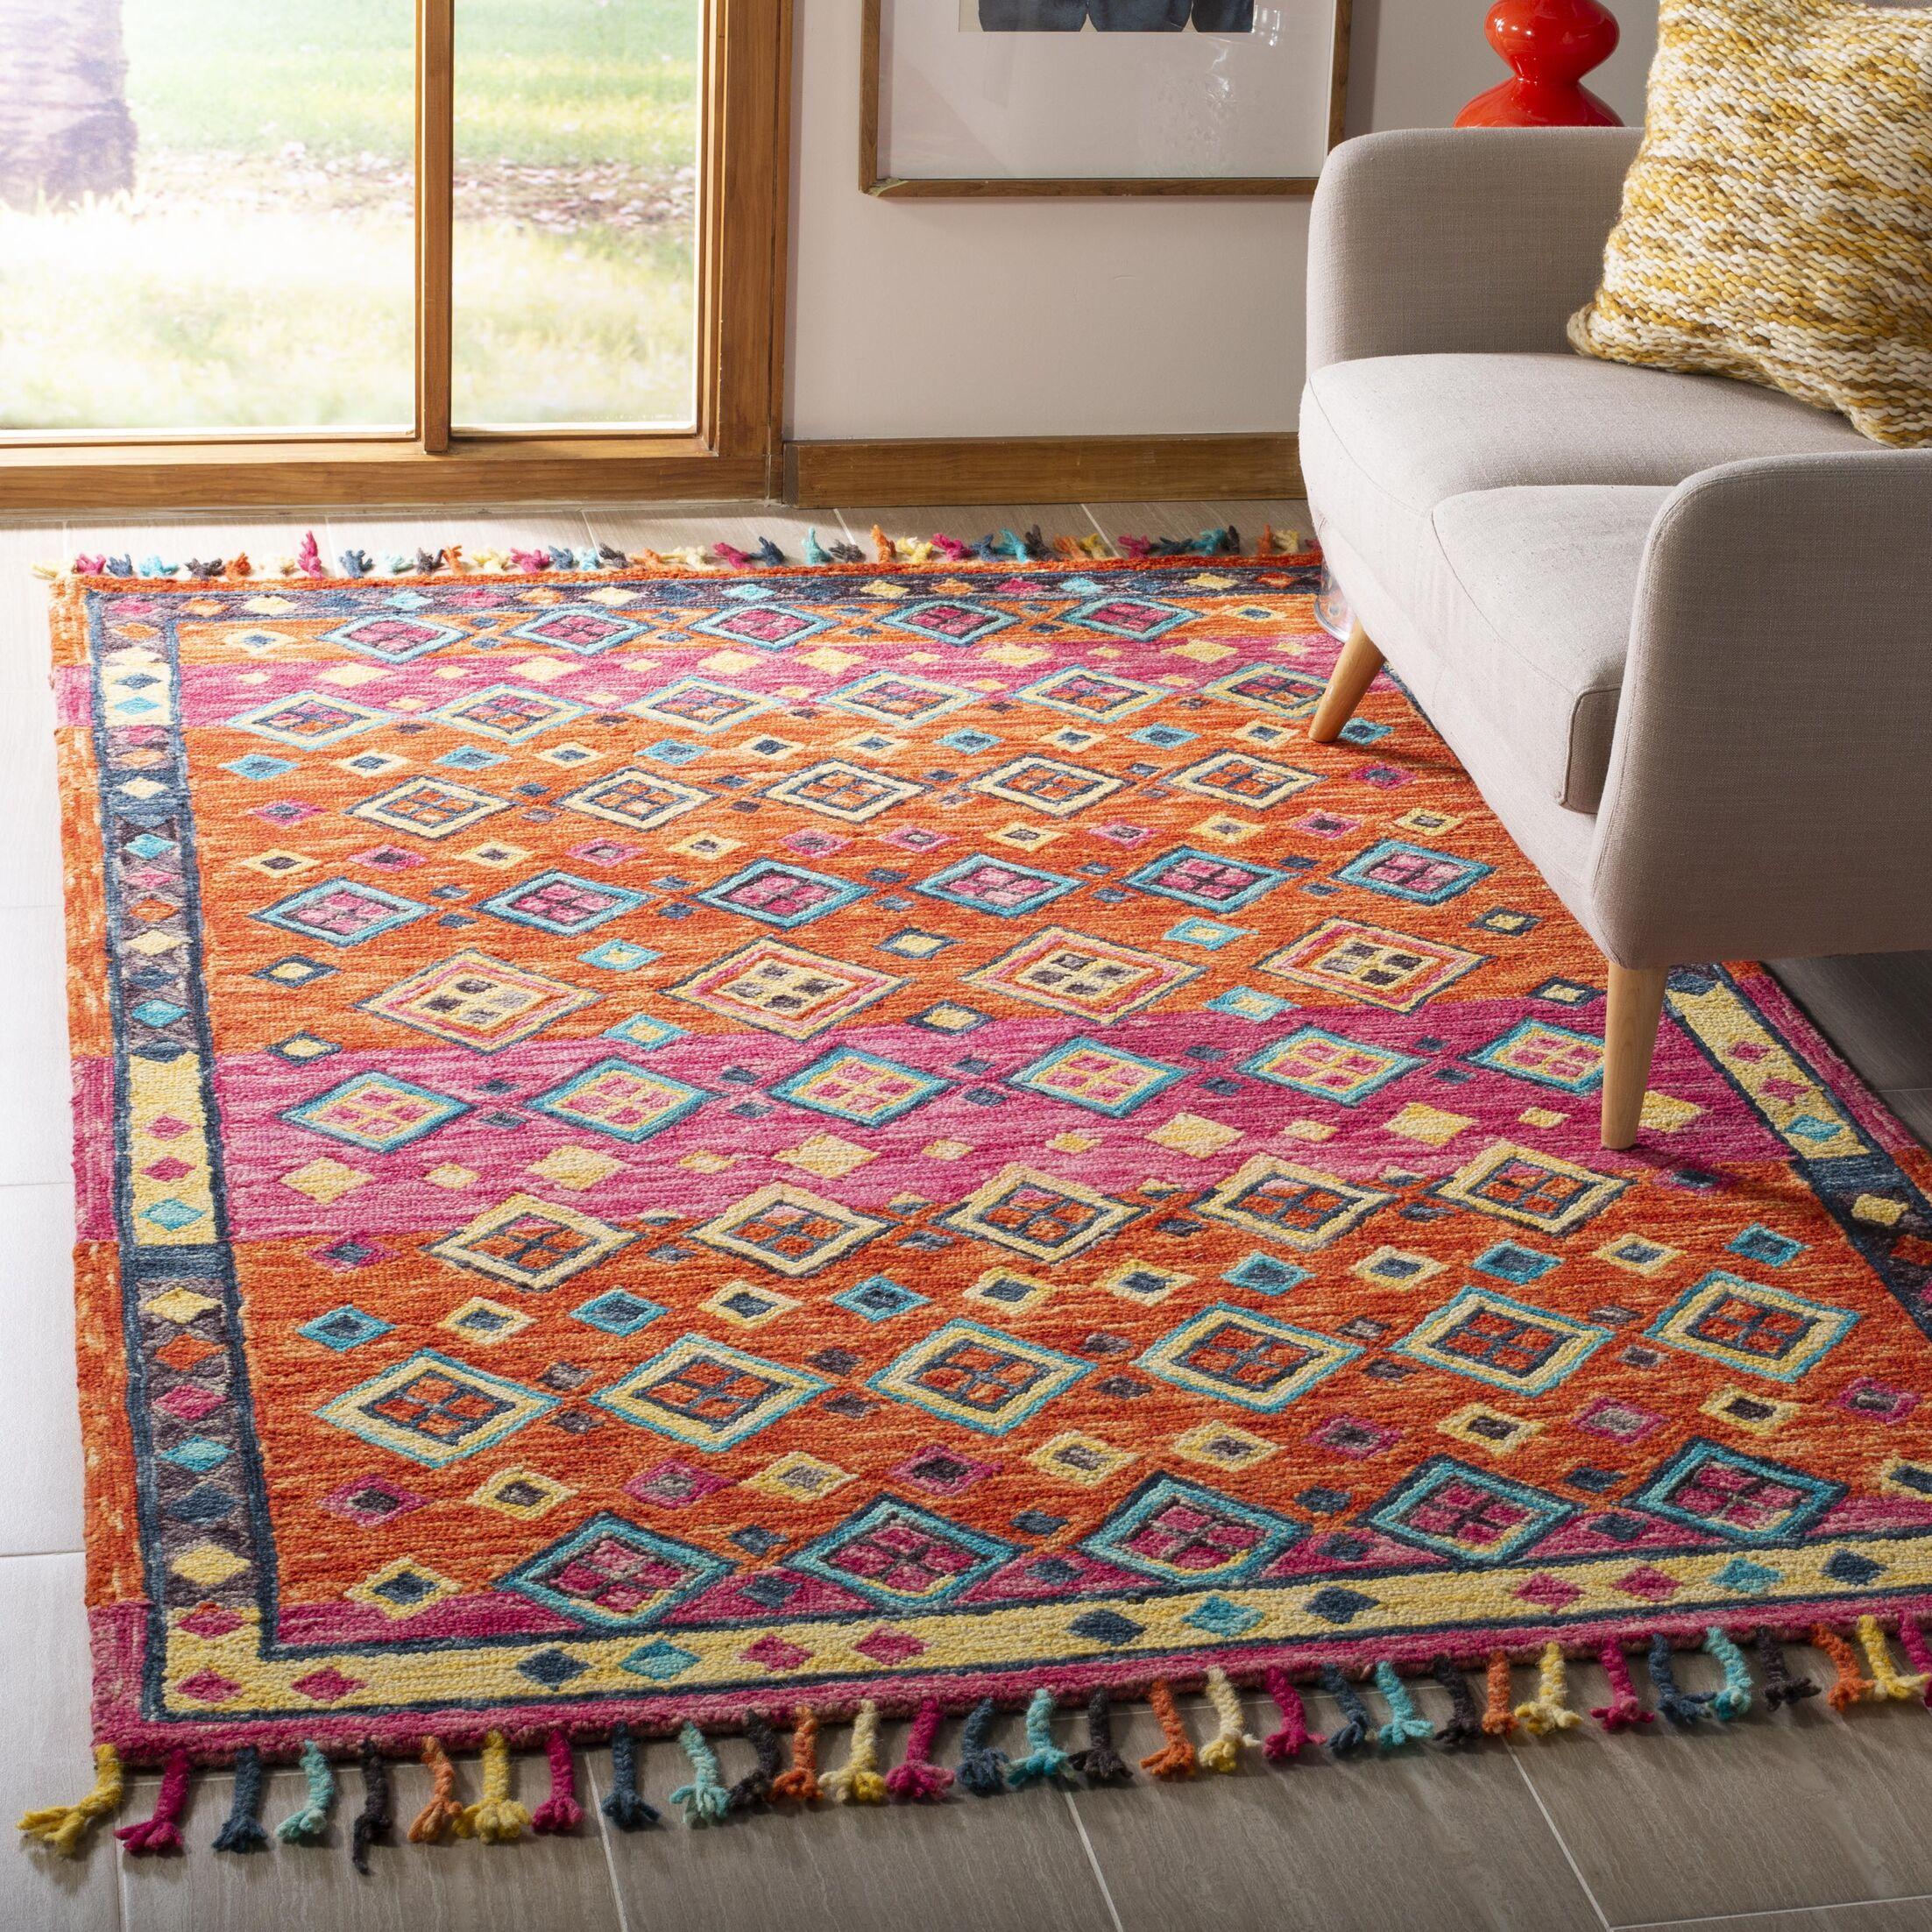 Sharo Hand-Tufted Wool Orange Area Rug Rug Size: Rectangle 5' x 8'